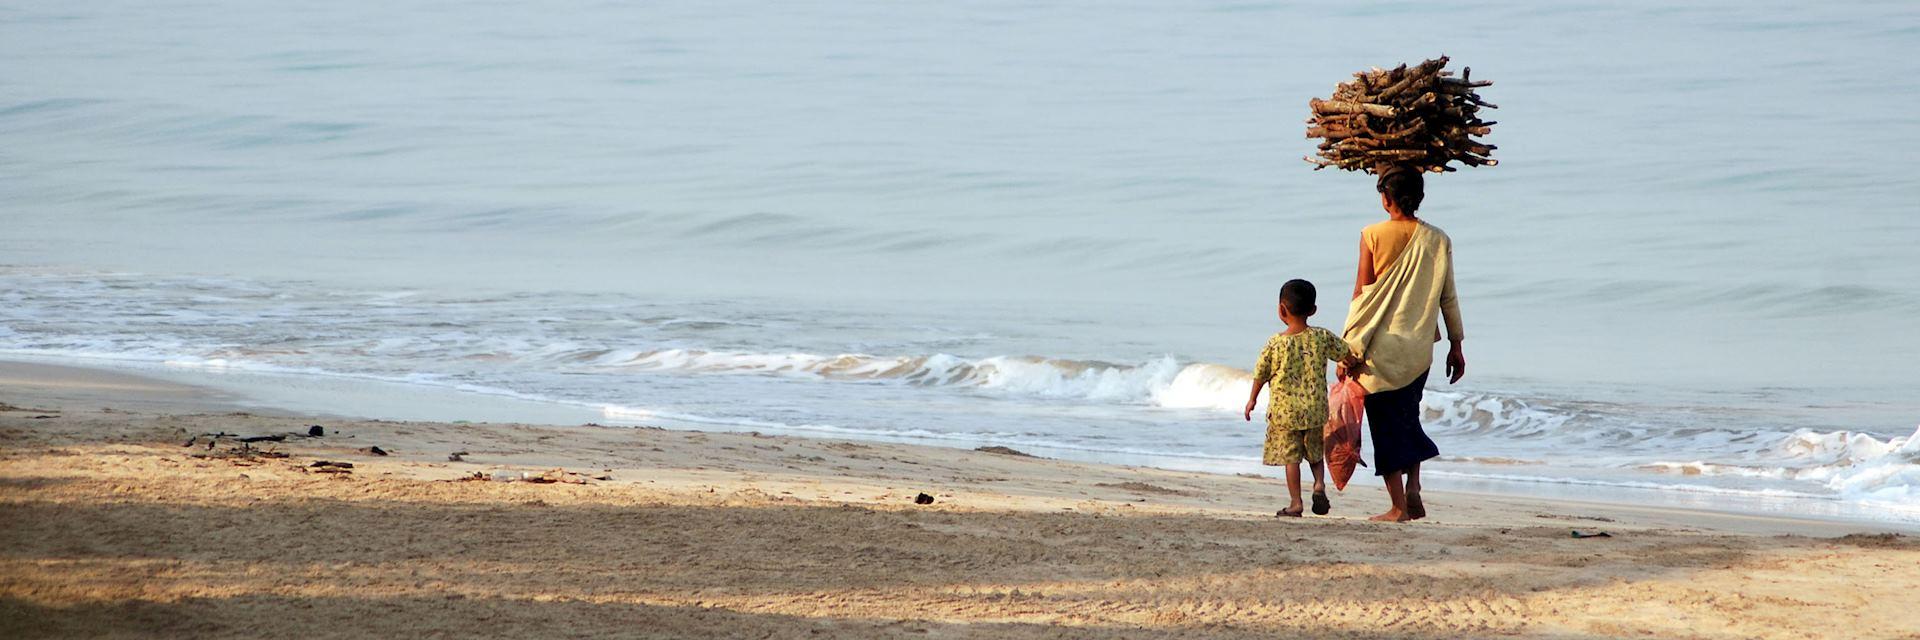 Ngapali Beach, Burma (Myanmar)